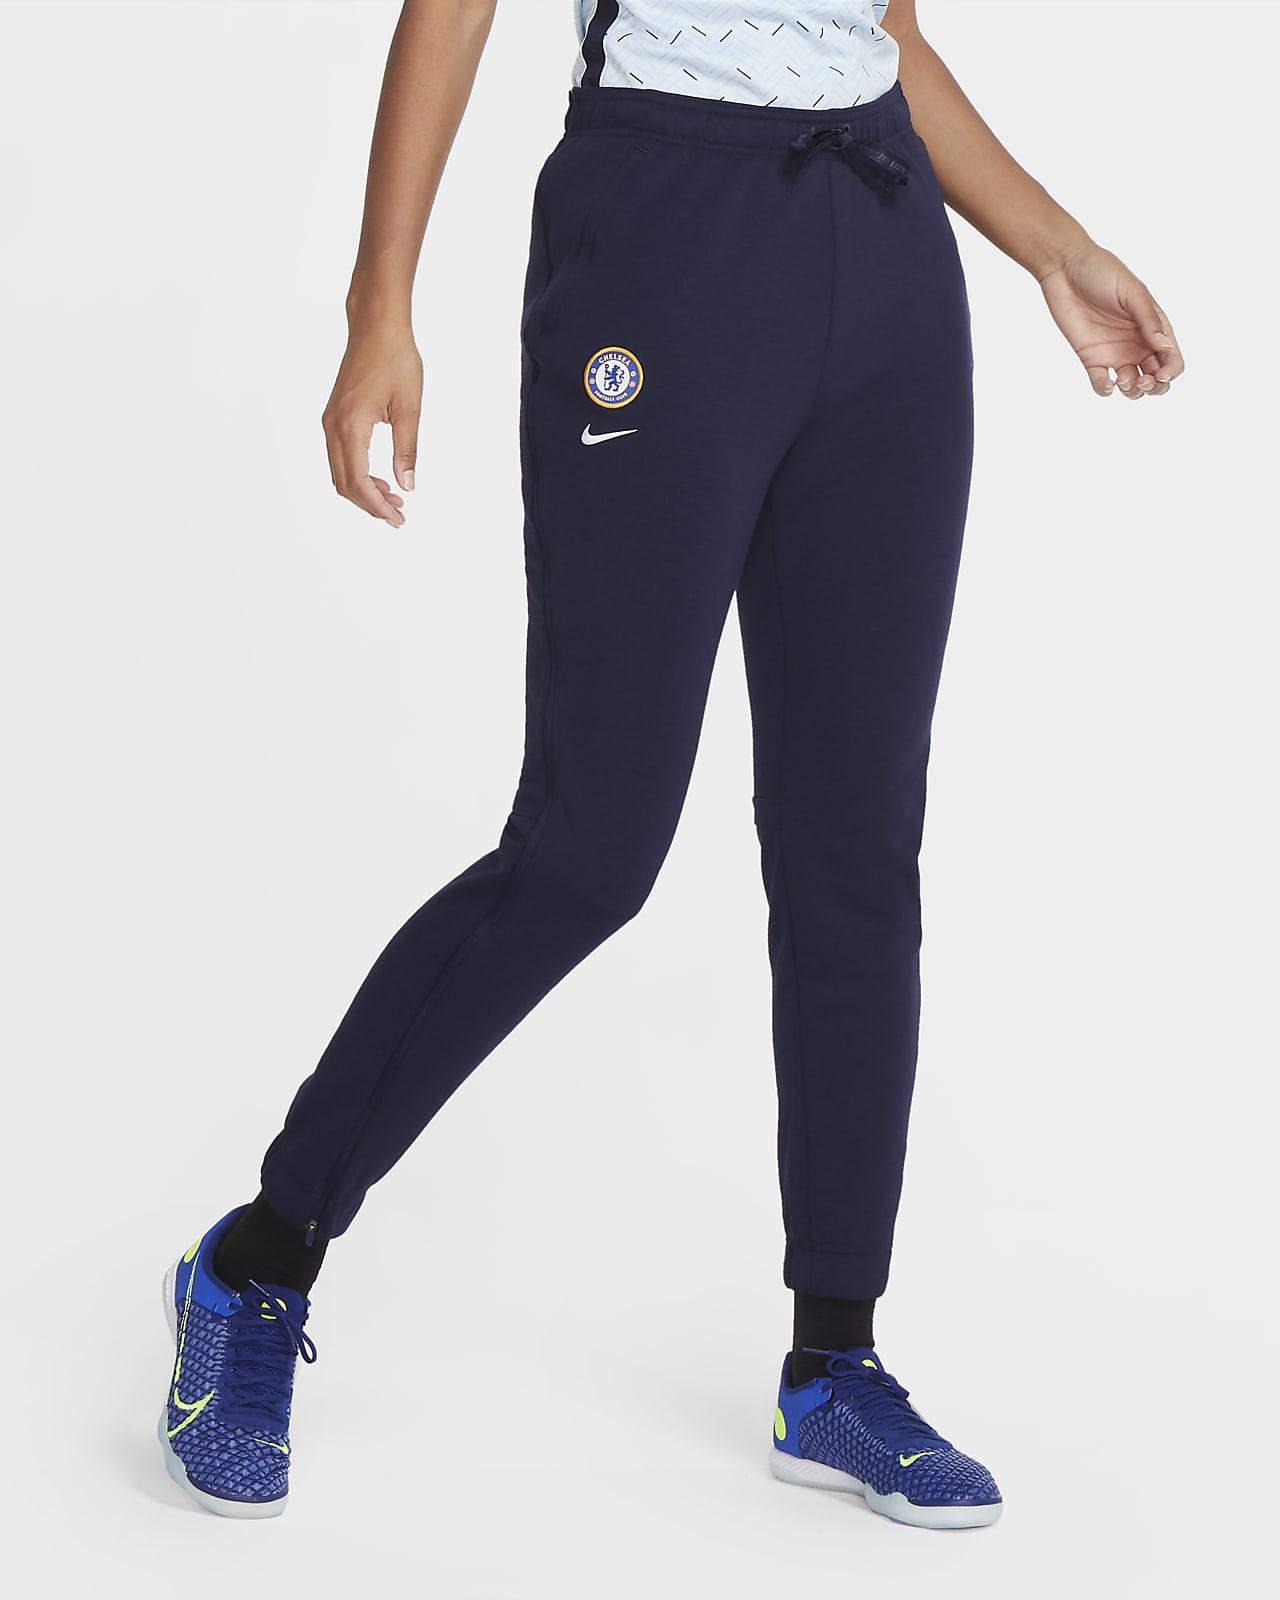 Chelsea F.C. Women's Knit Football Pants